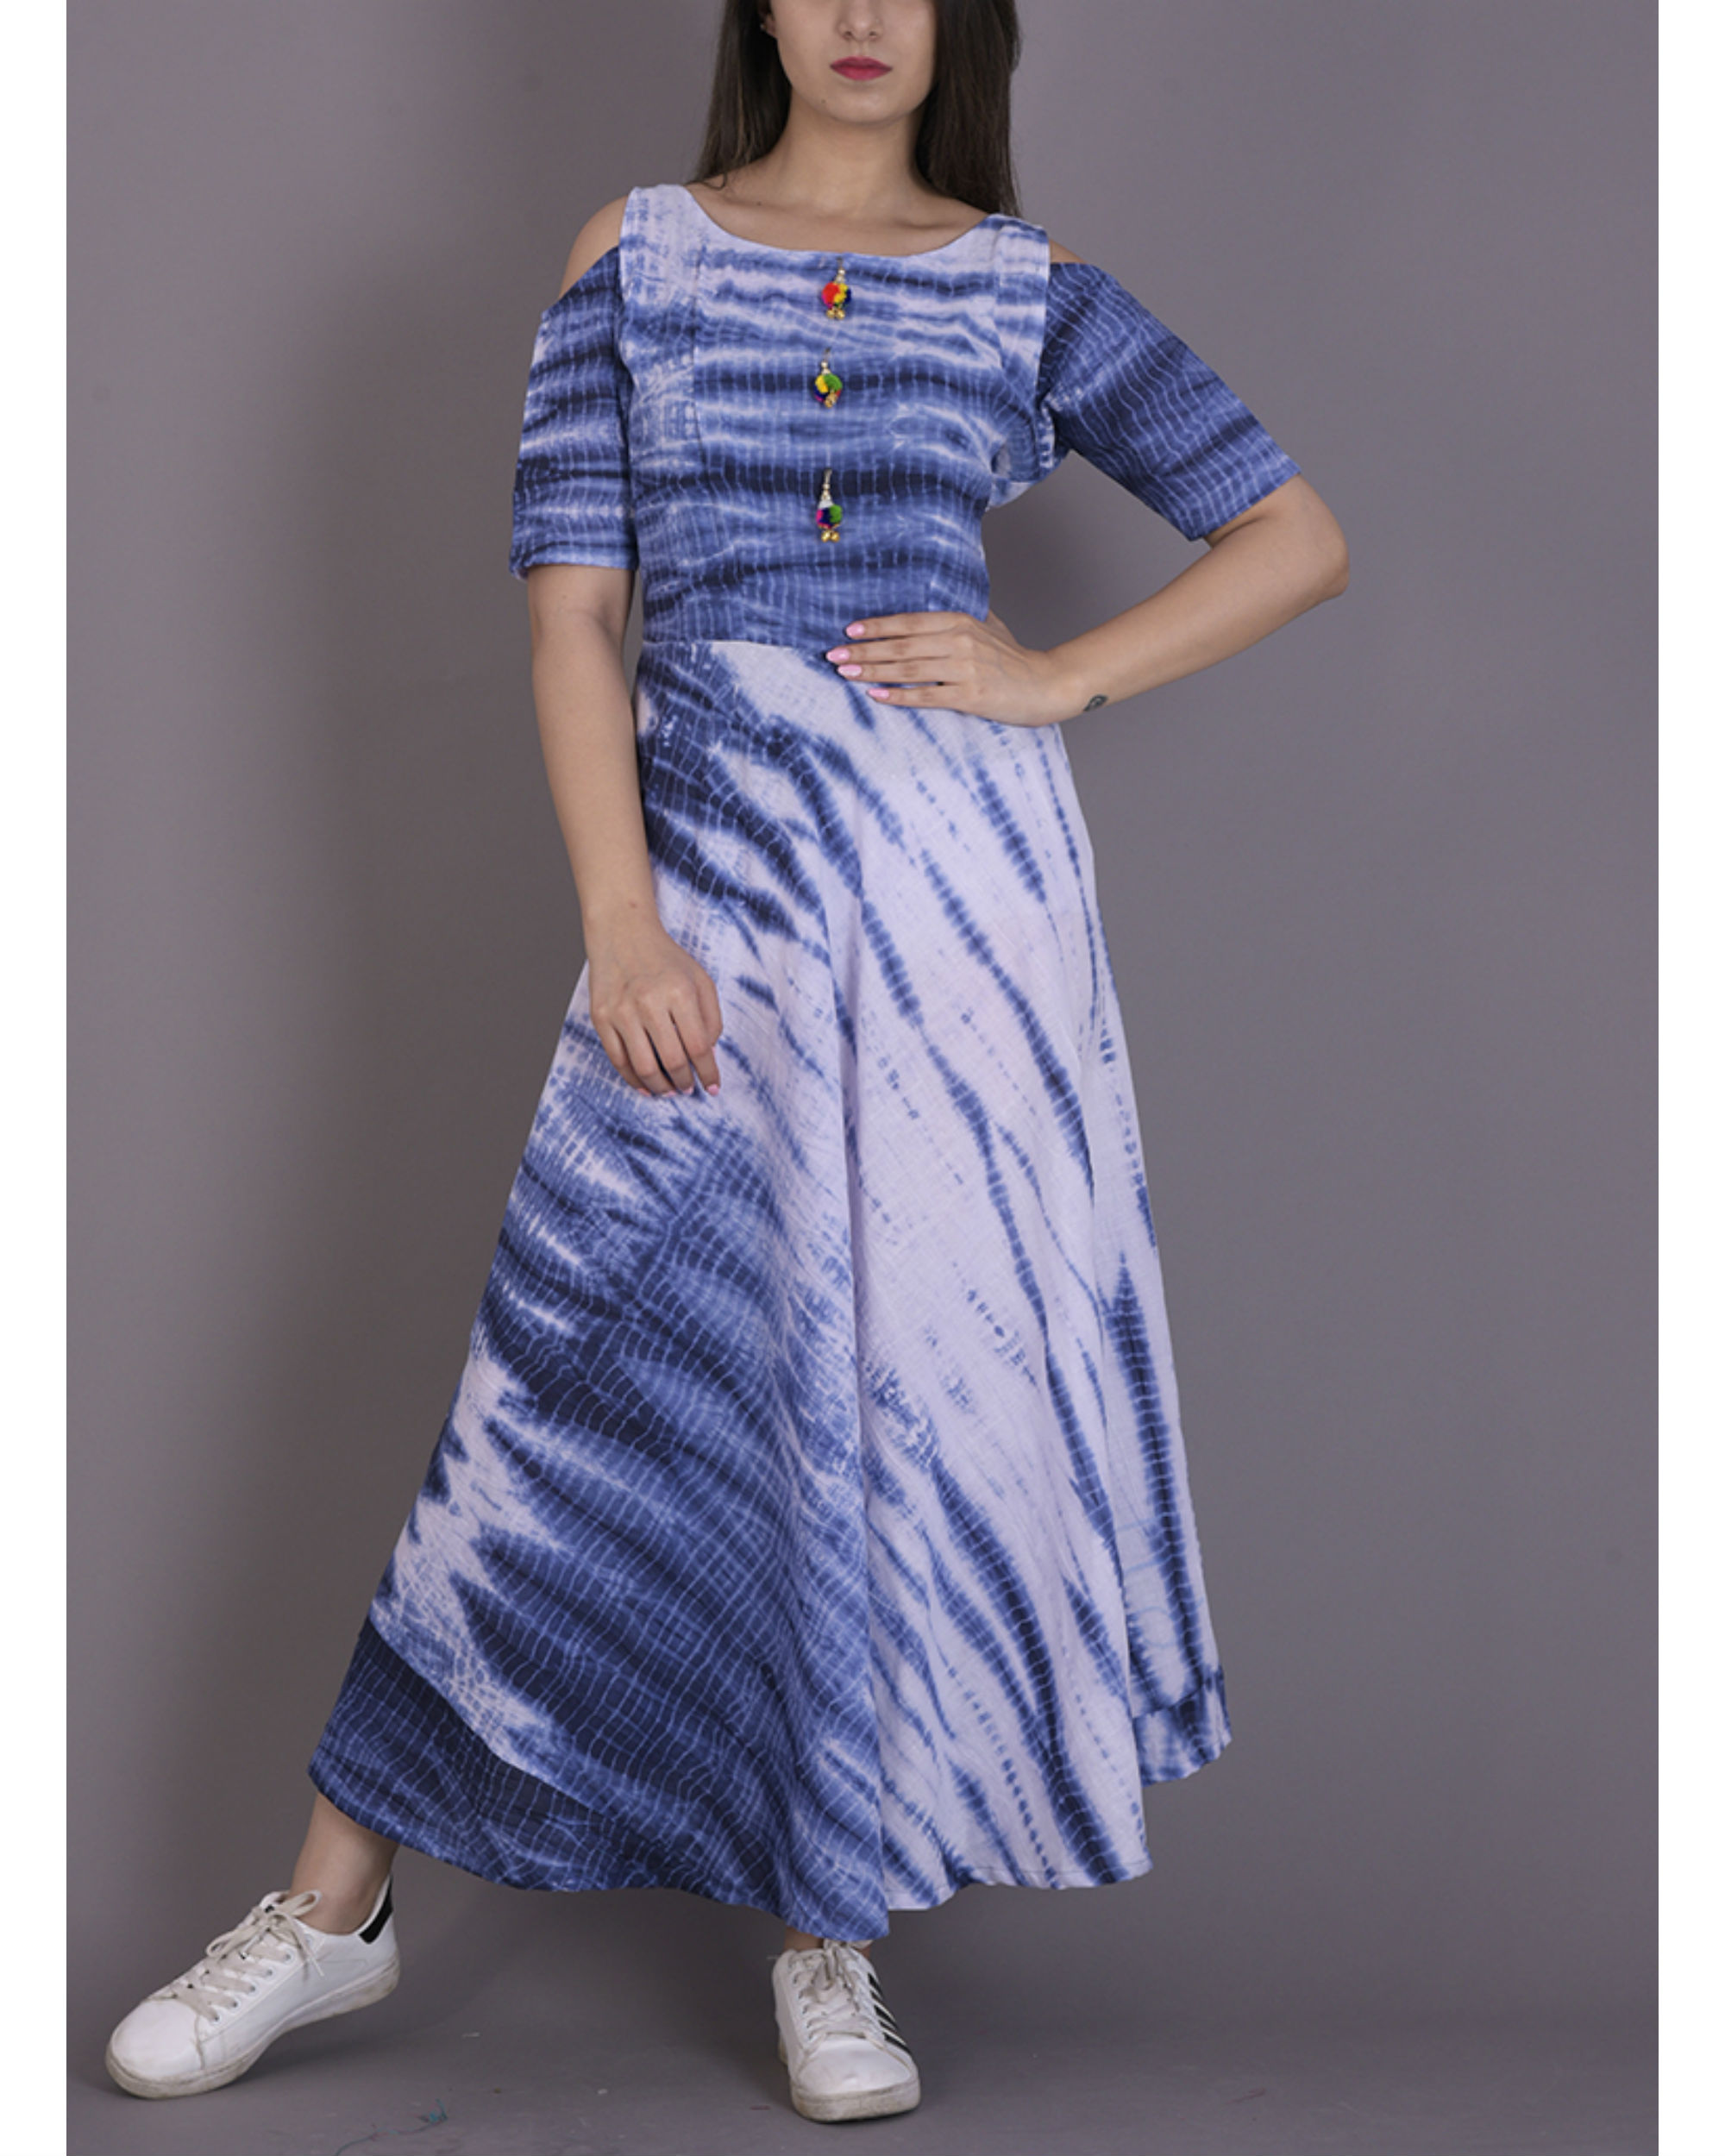 Blue tie and dye dress